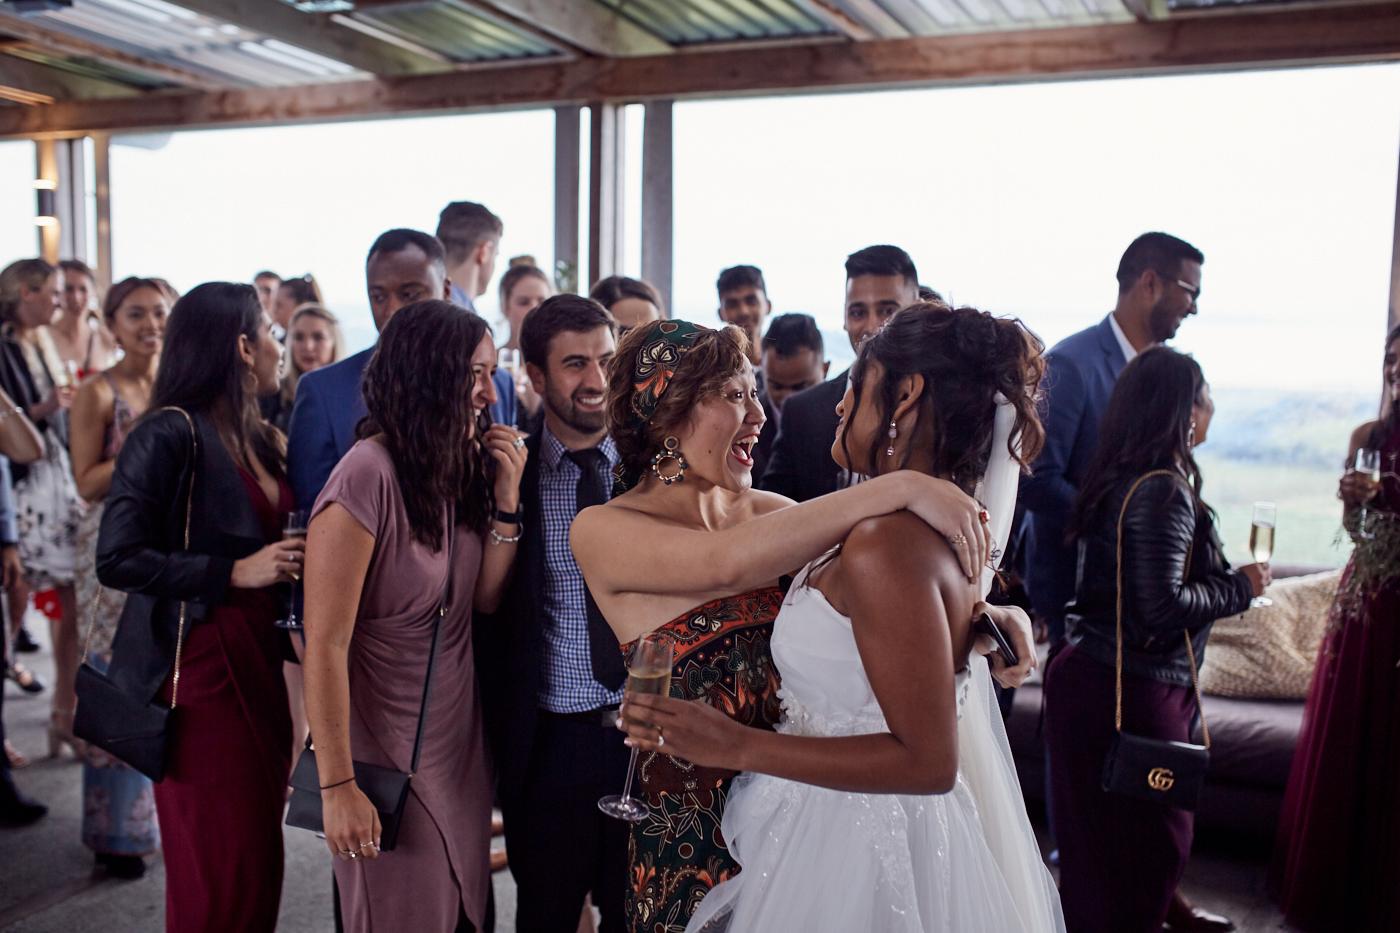 Guest congratulates the bride